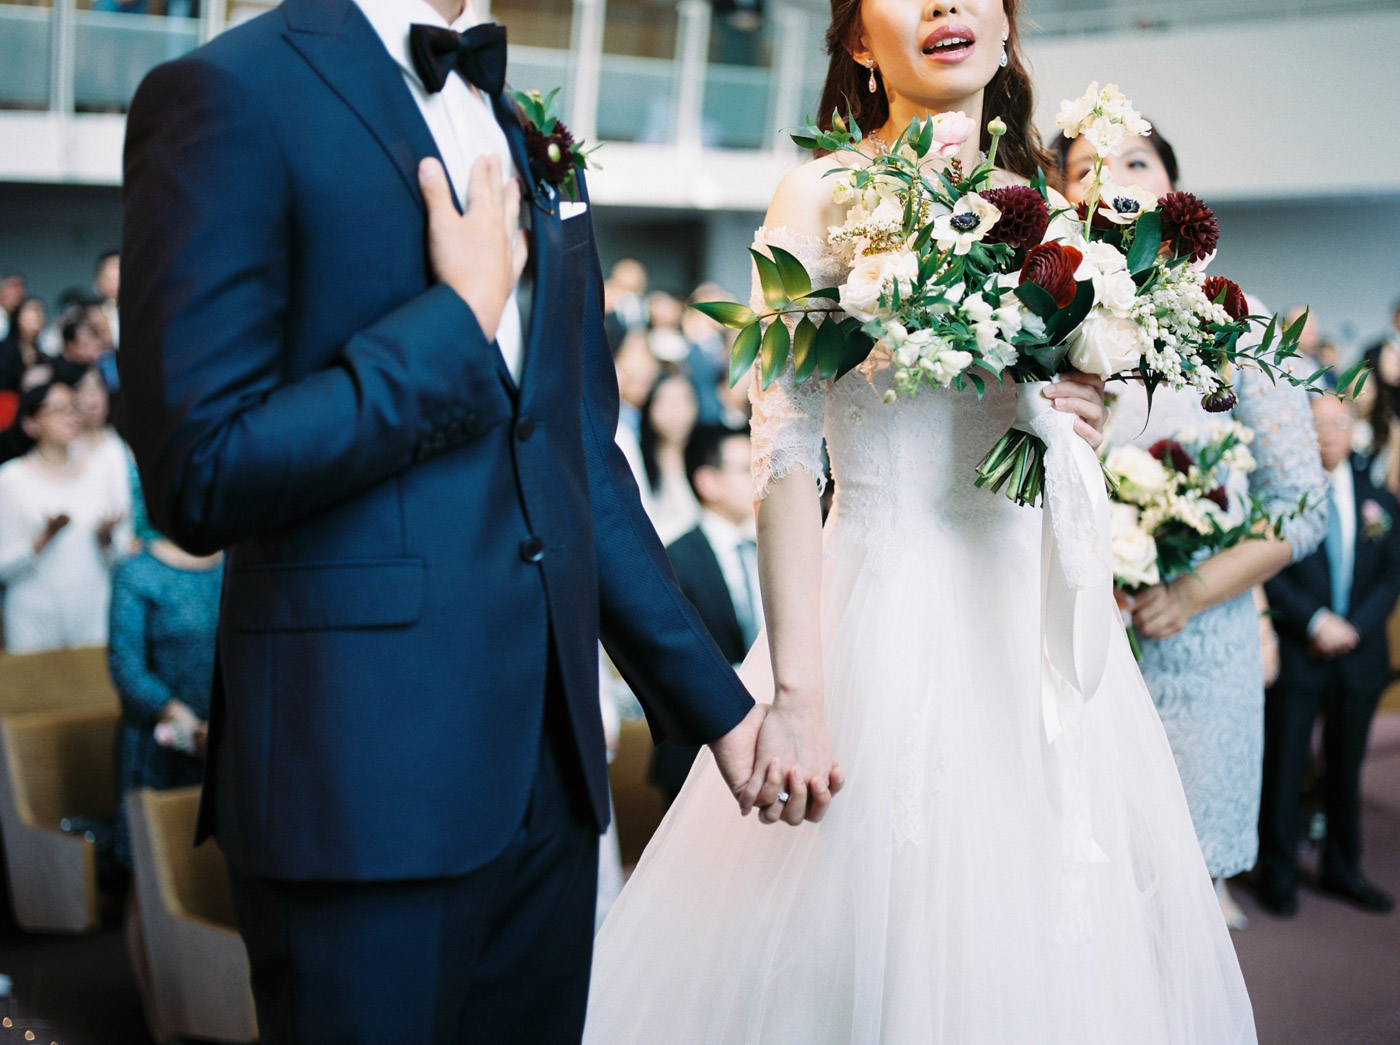 toronto_wedding_photographer_documentary_fine_art_photography-28.jpg